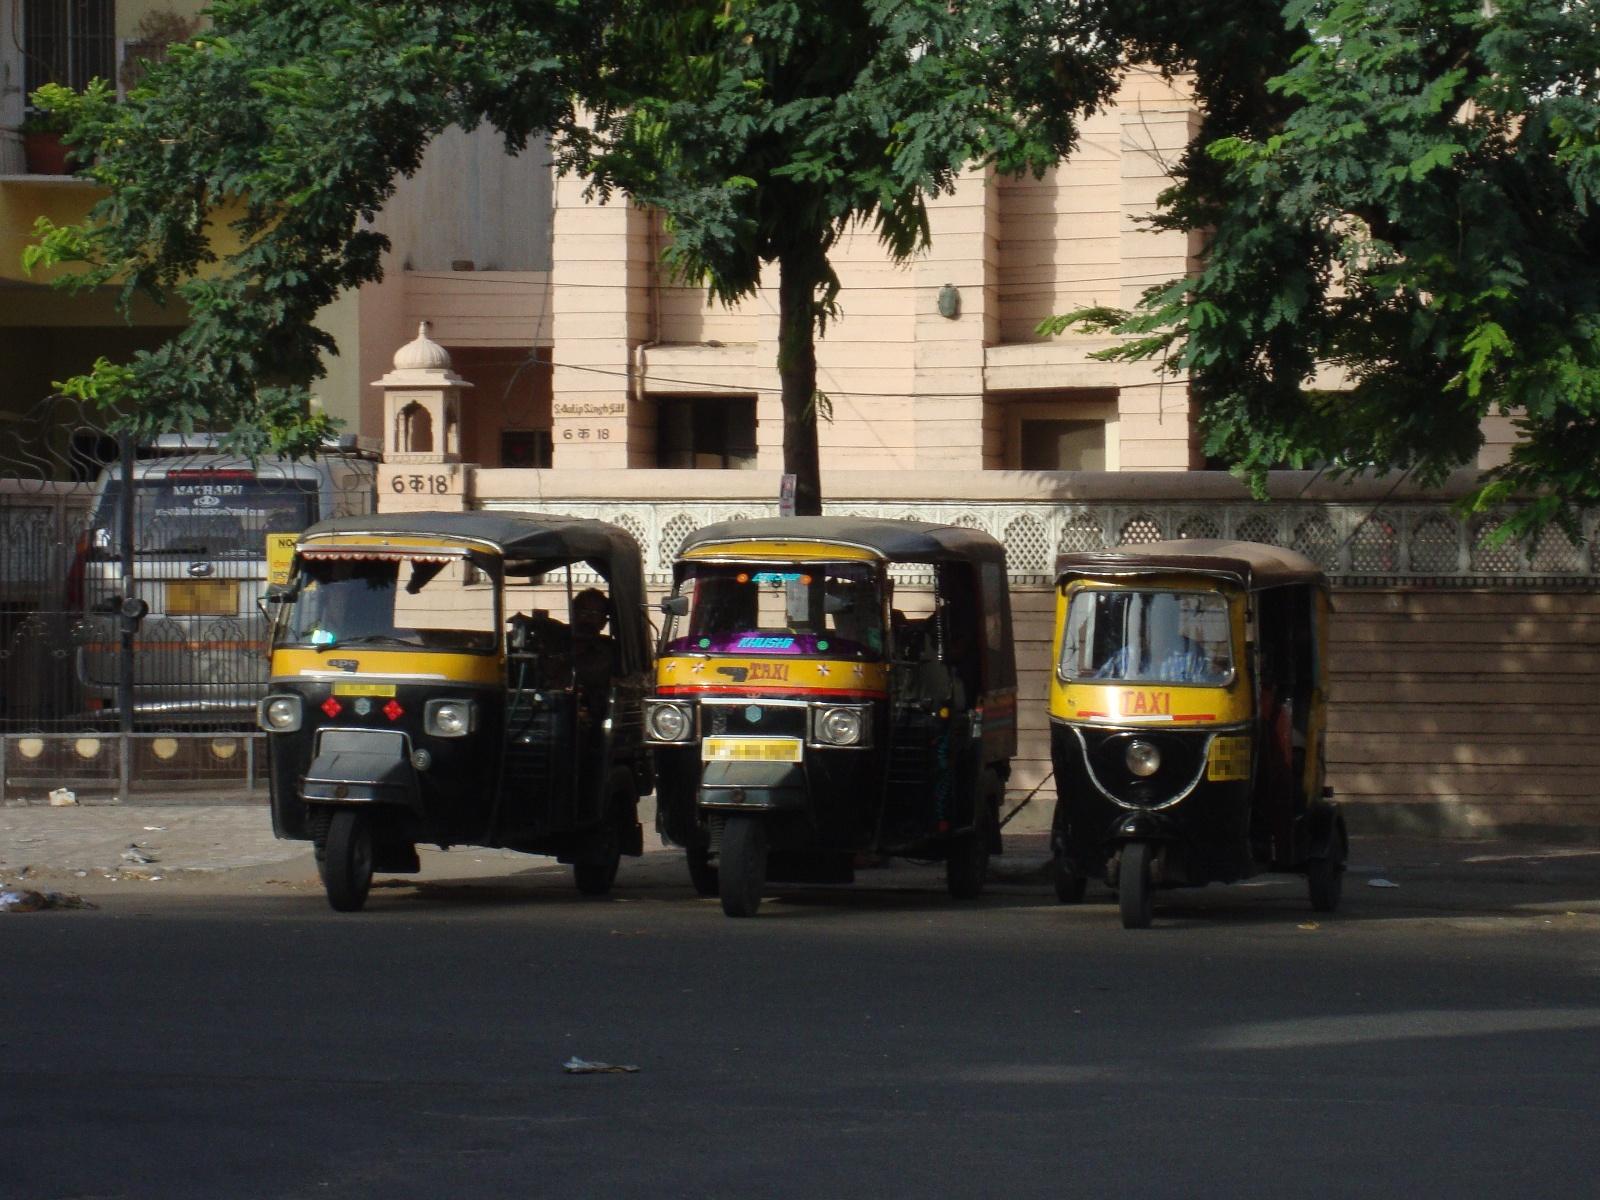 09487-rickshaw-family_1600px